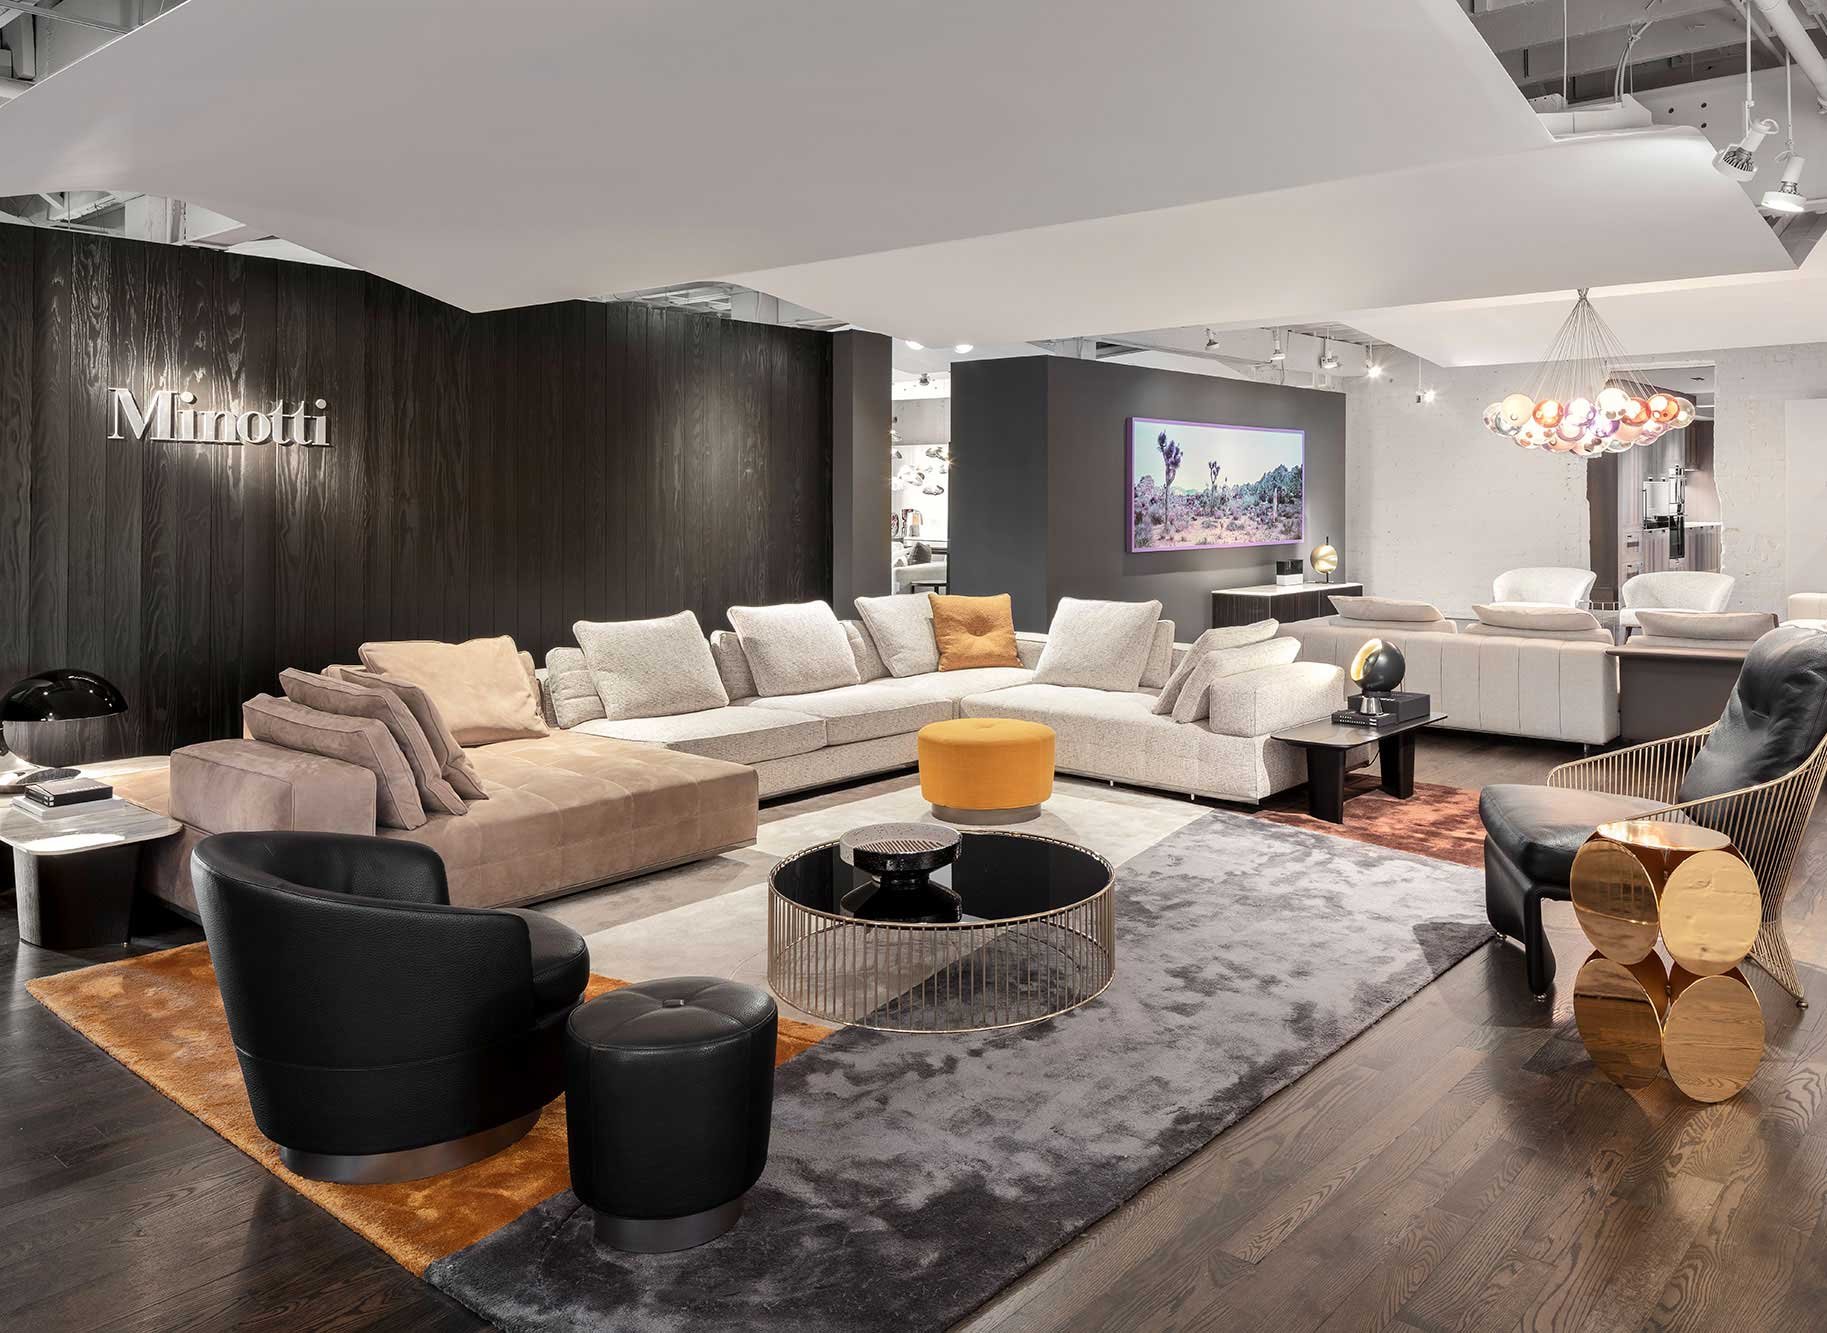 living room image of minotti furniture